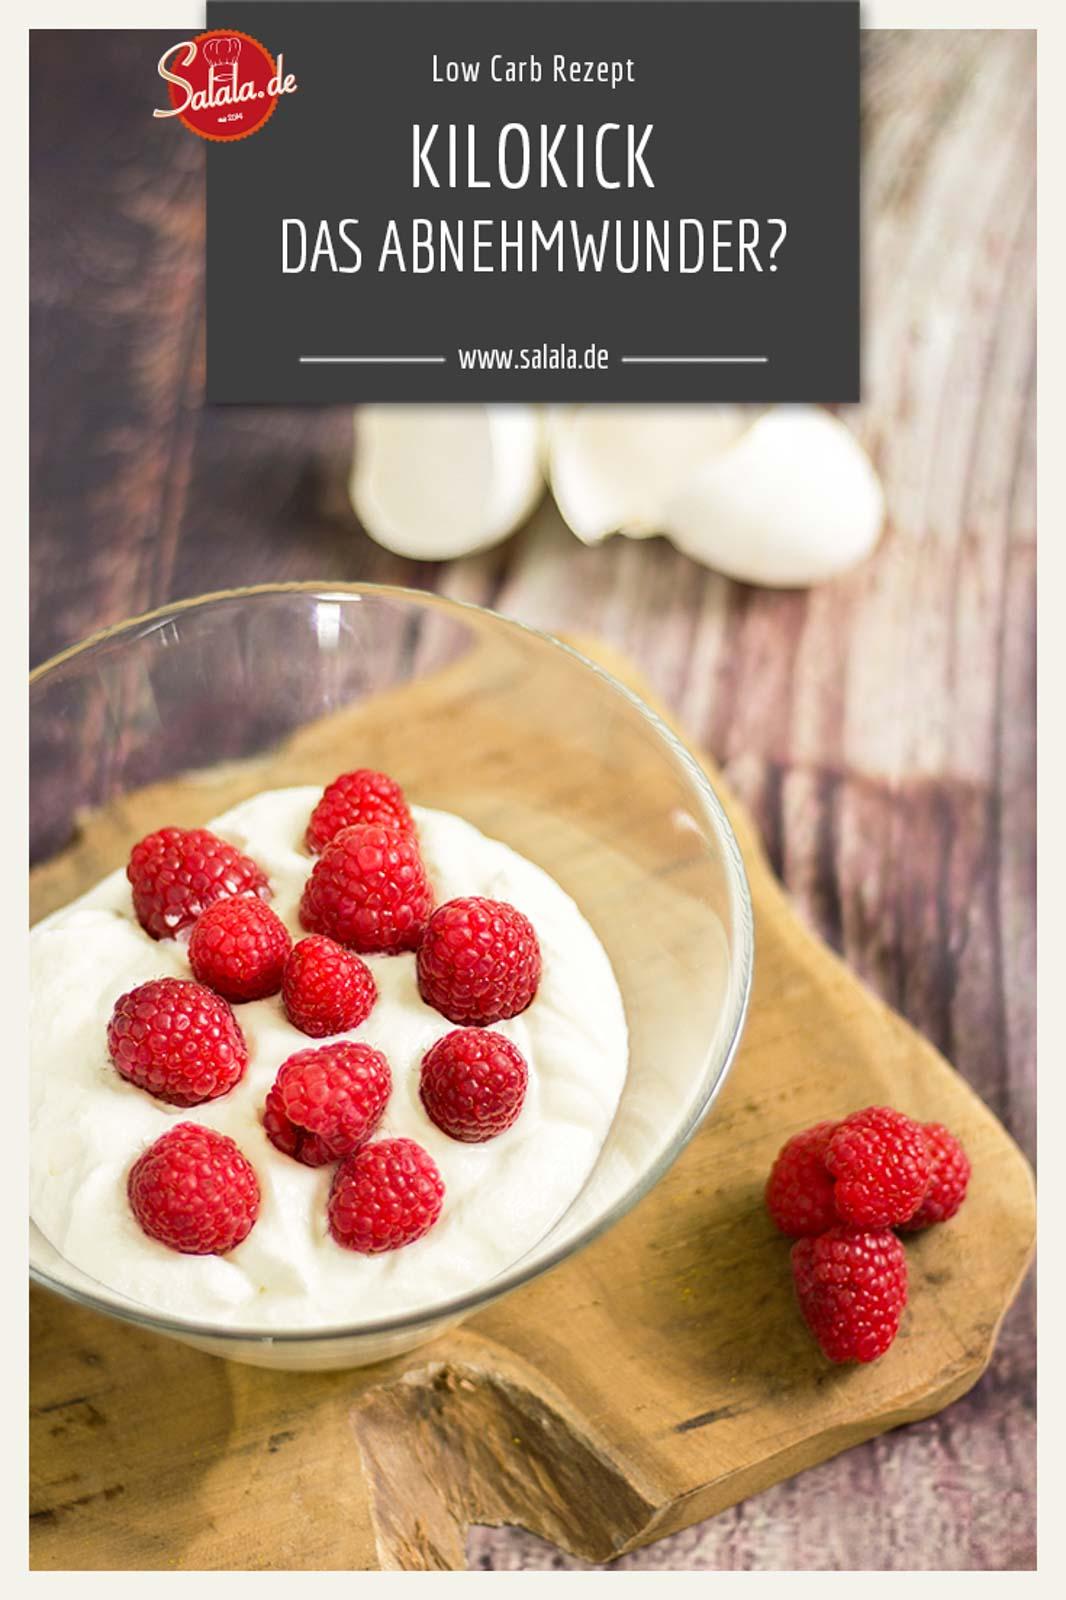 Kilokick mit Himbeeren - by salala.de - Low Carb Rezept für das Abnehmwunder selbst gemacht wie funktioniert Fettverbrennung #kilokick #fettverbrennung #abnehmen #einfacherezepte #rezepte #lowcarb #schlankimschlaf #lowcarbrecipes #recipes #rezeptemitquark #schnellerezepte #einfachabnehmen #schnellabnehmen #kilokickrezept